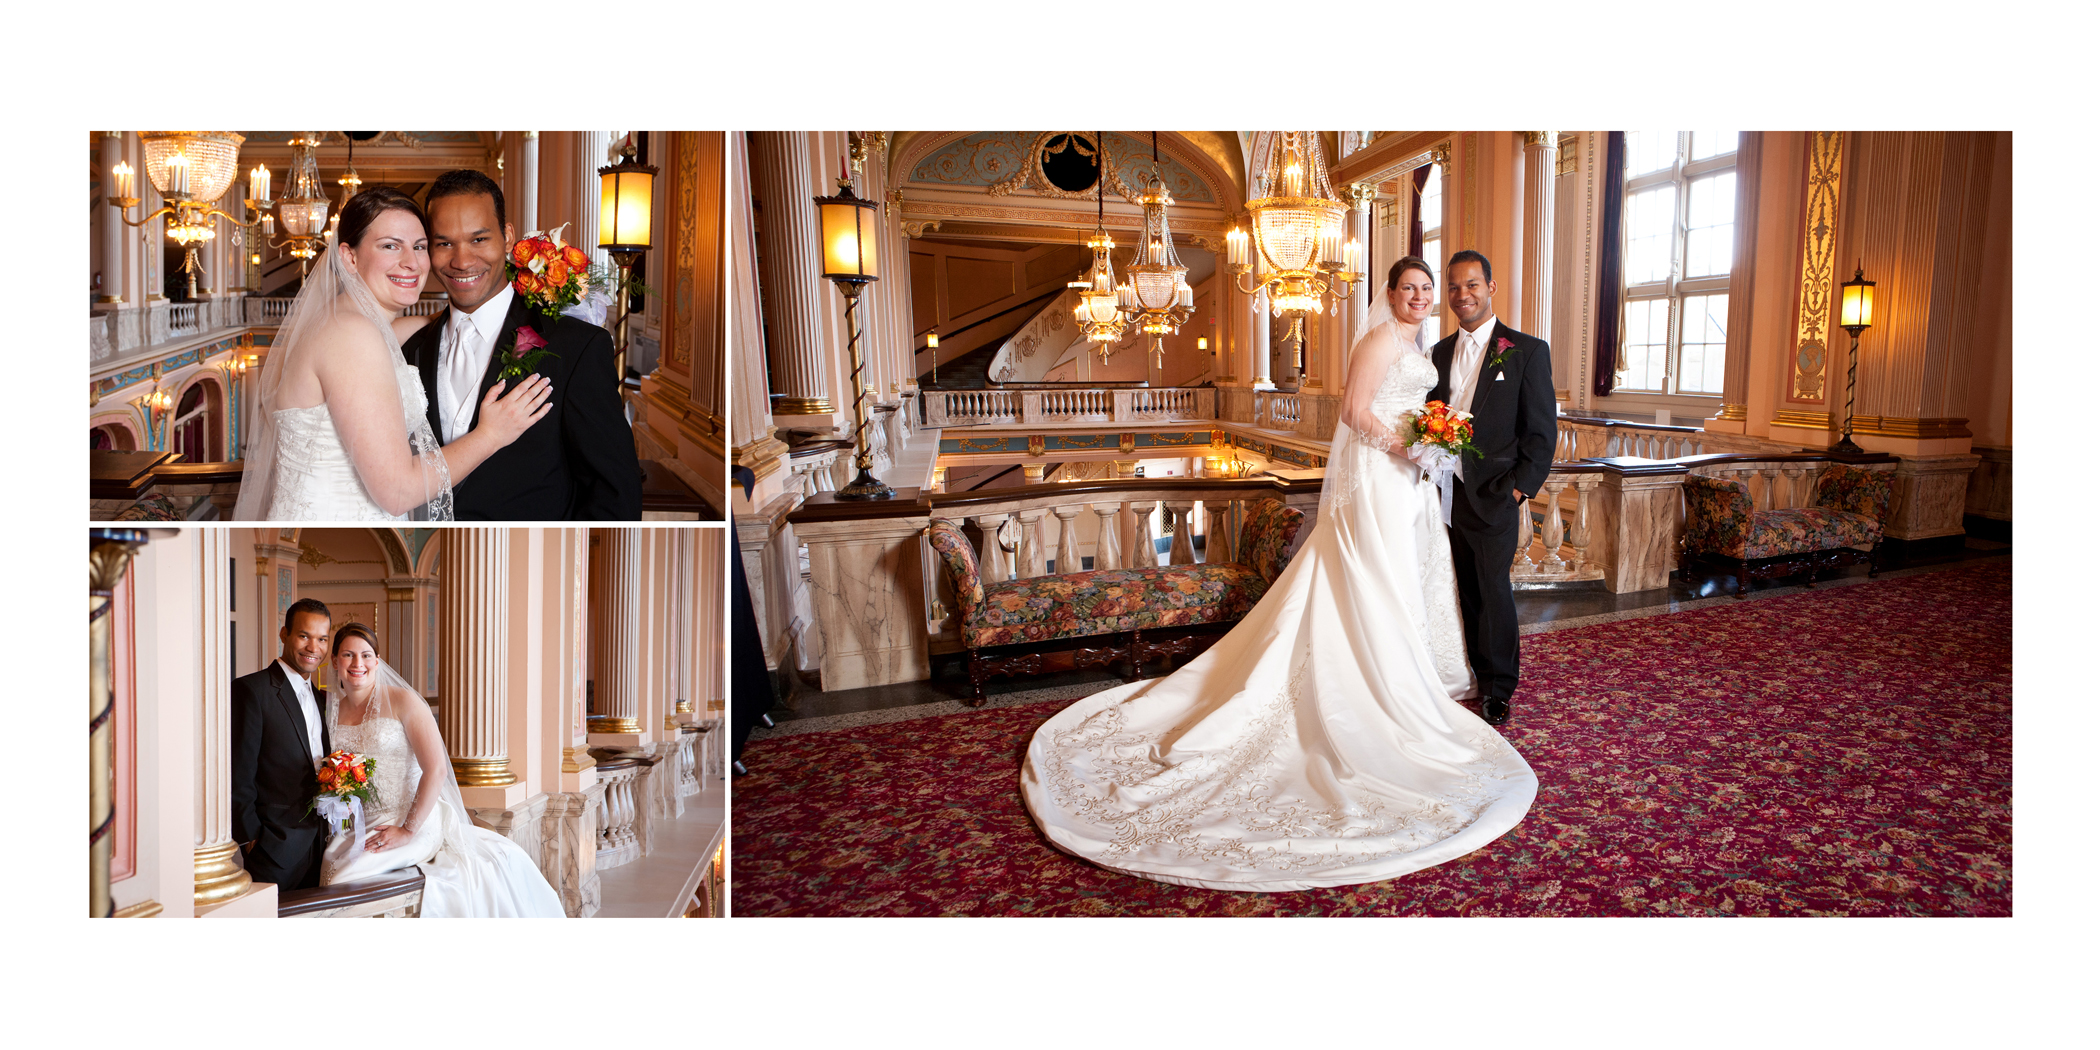 Wedding-Photography-Palaise-Royale-South-Bend-Indiana_25.jpg